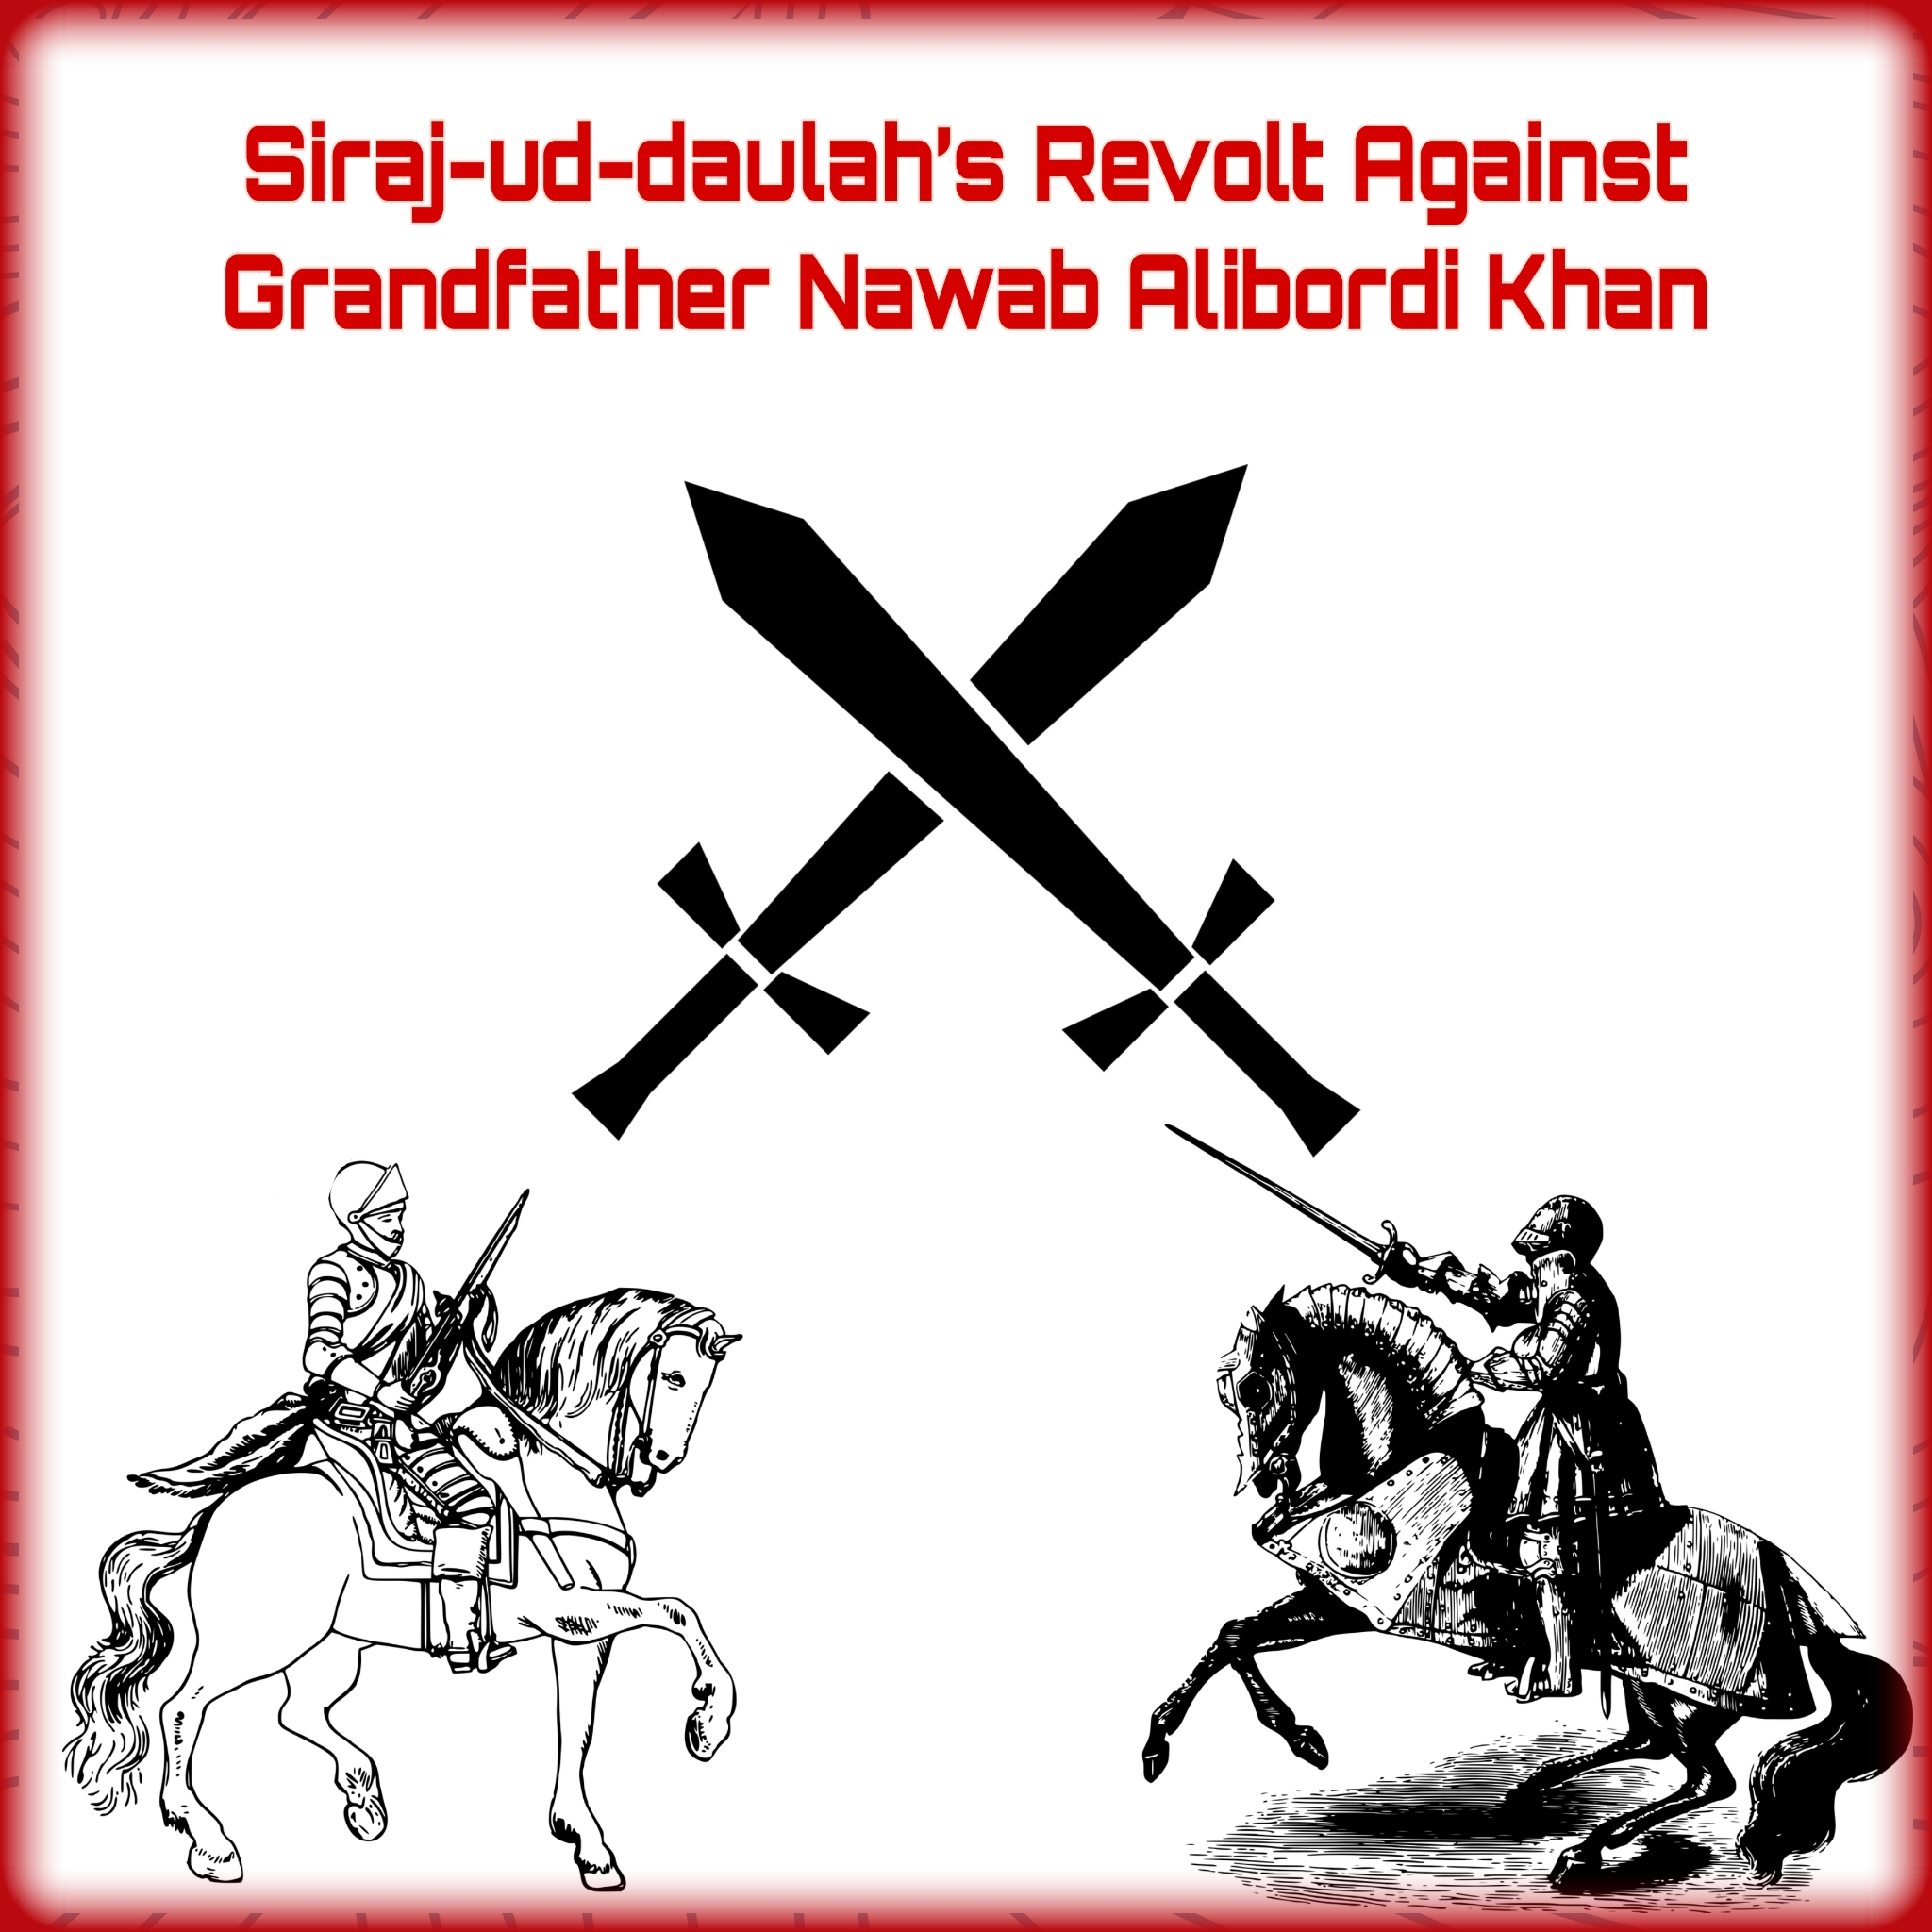 Siraj ud Daulah's Revolt Against Grandfather Nawab Alibordi Khan